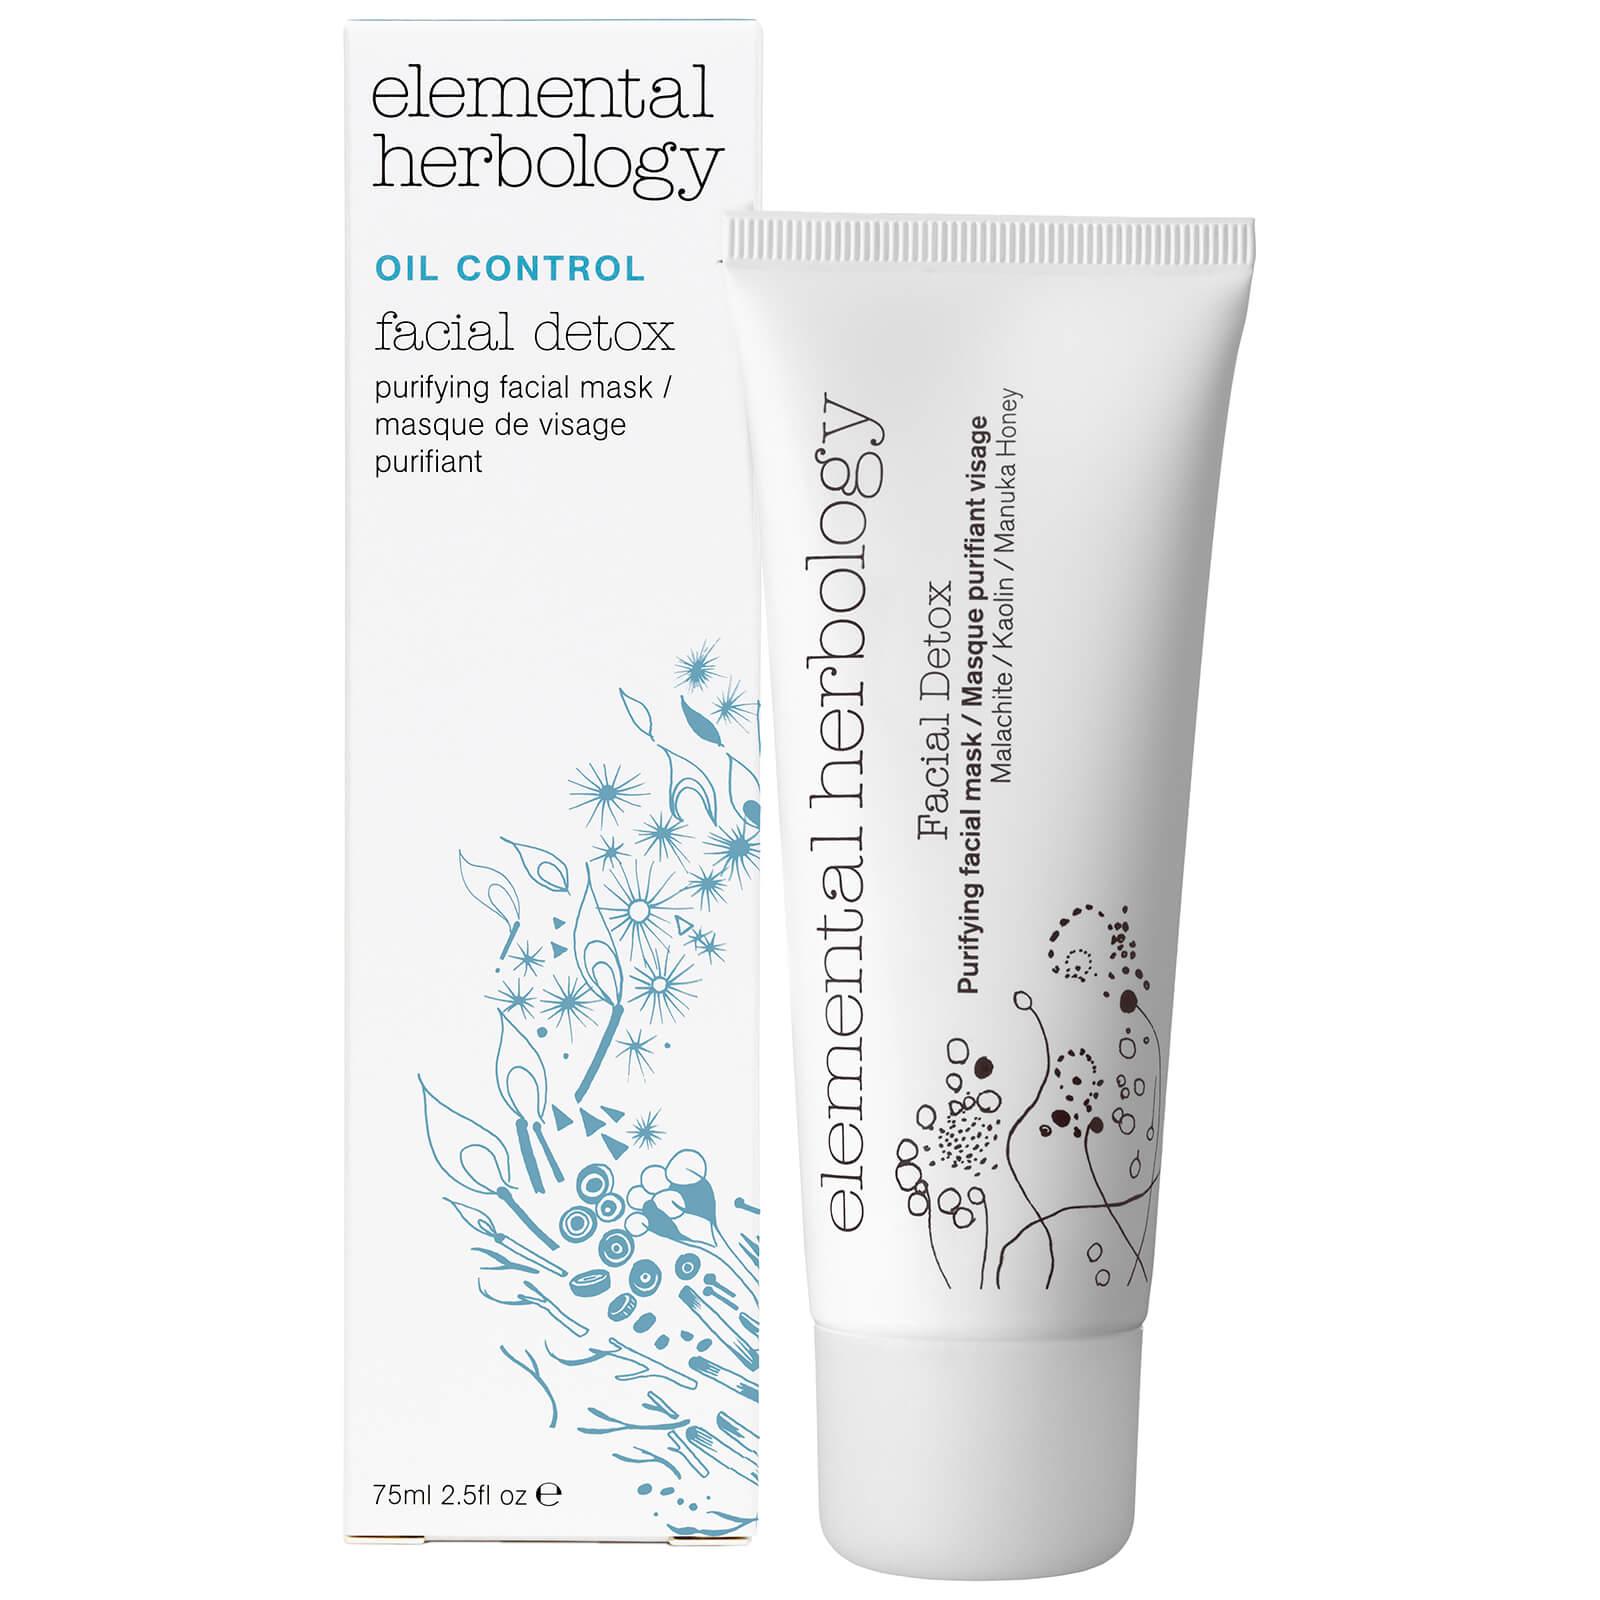 Elemental Herbology Facial Detox Purifying Facial Mask 75ml